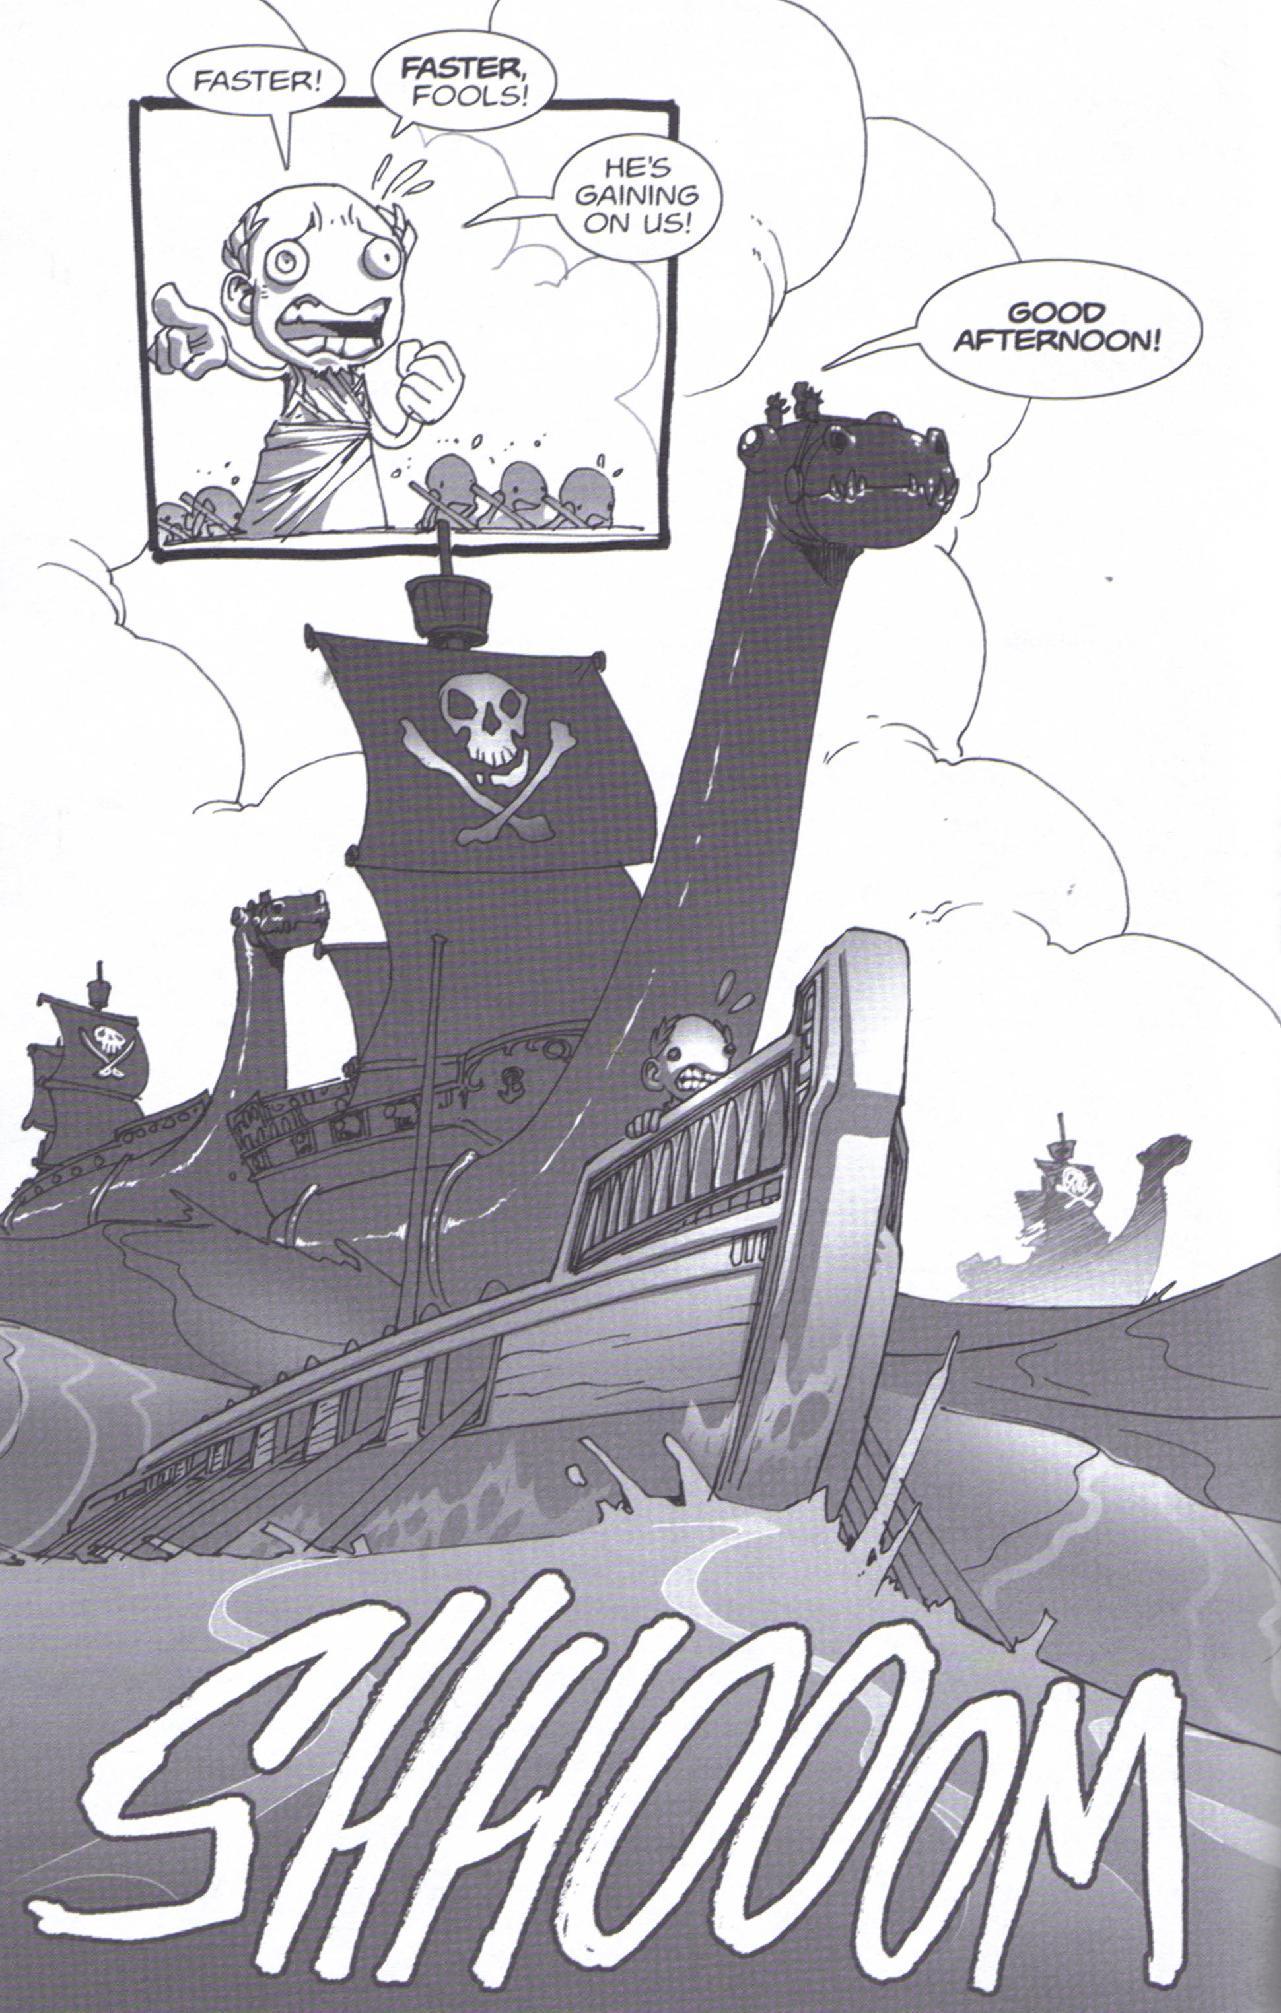 Read online Pirates vs. Ninjas: Global Harming comic -  Issue # Full - 10